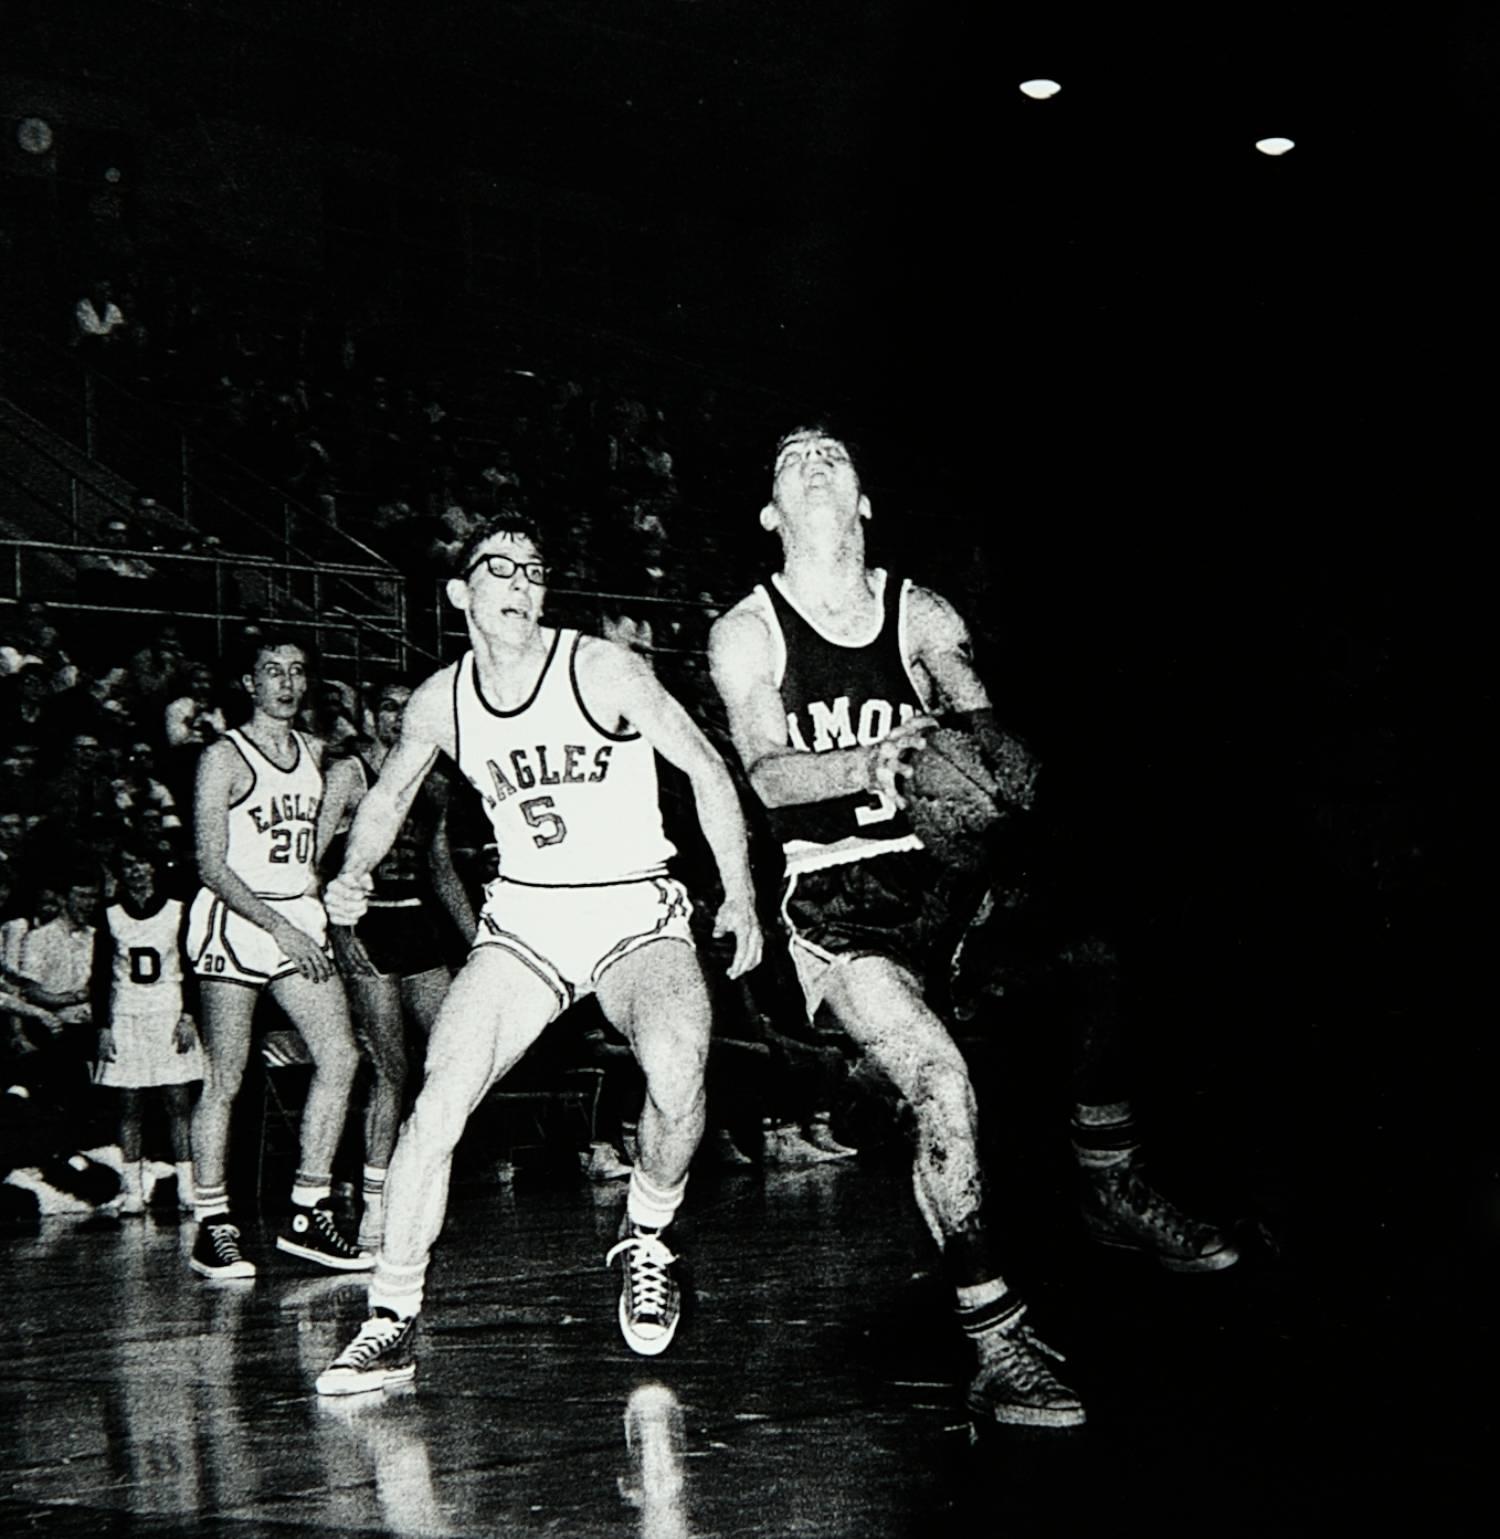 Basketball Twilight Zone (Anchorage, Alaska)